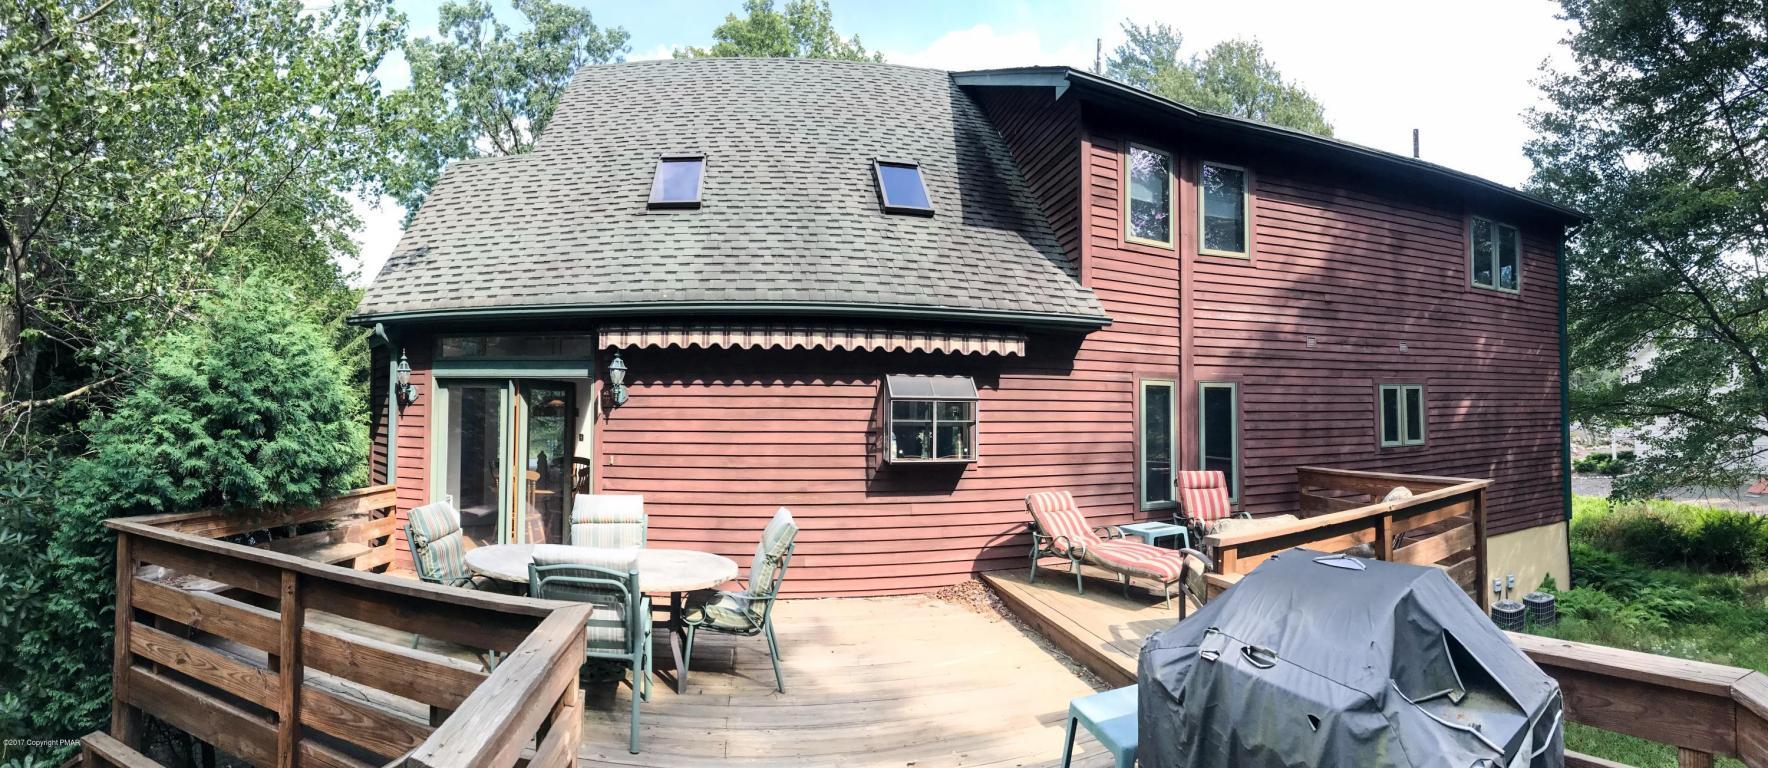 37 Kent Clarke Rd, Lake Harmony, PA 18624